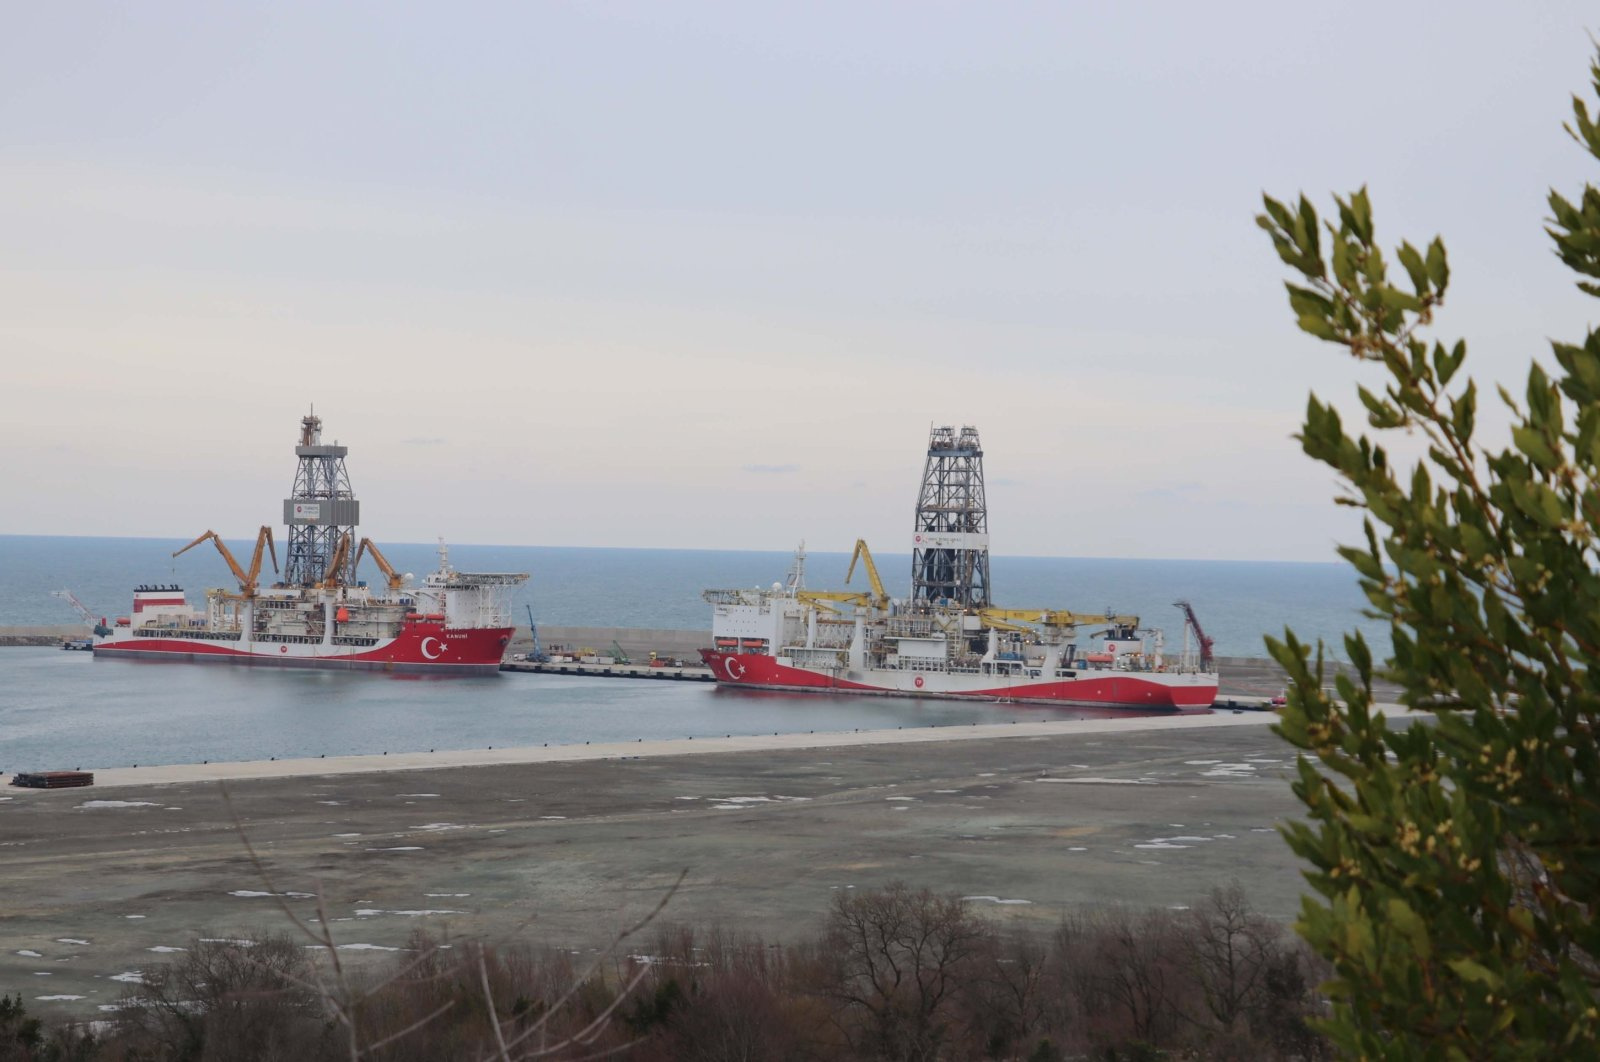 Turkey's drilling vessels Kanuni (L) and Fatih at the Port of Filyos, Zonguldak, Turkey, March, 20, 2021. (AA Photo)